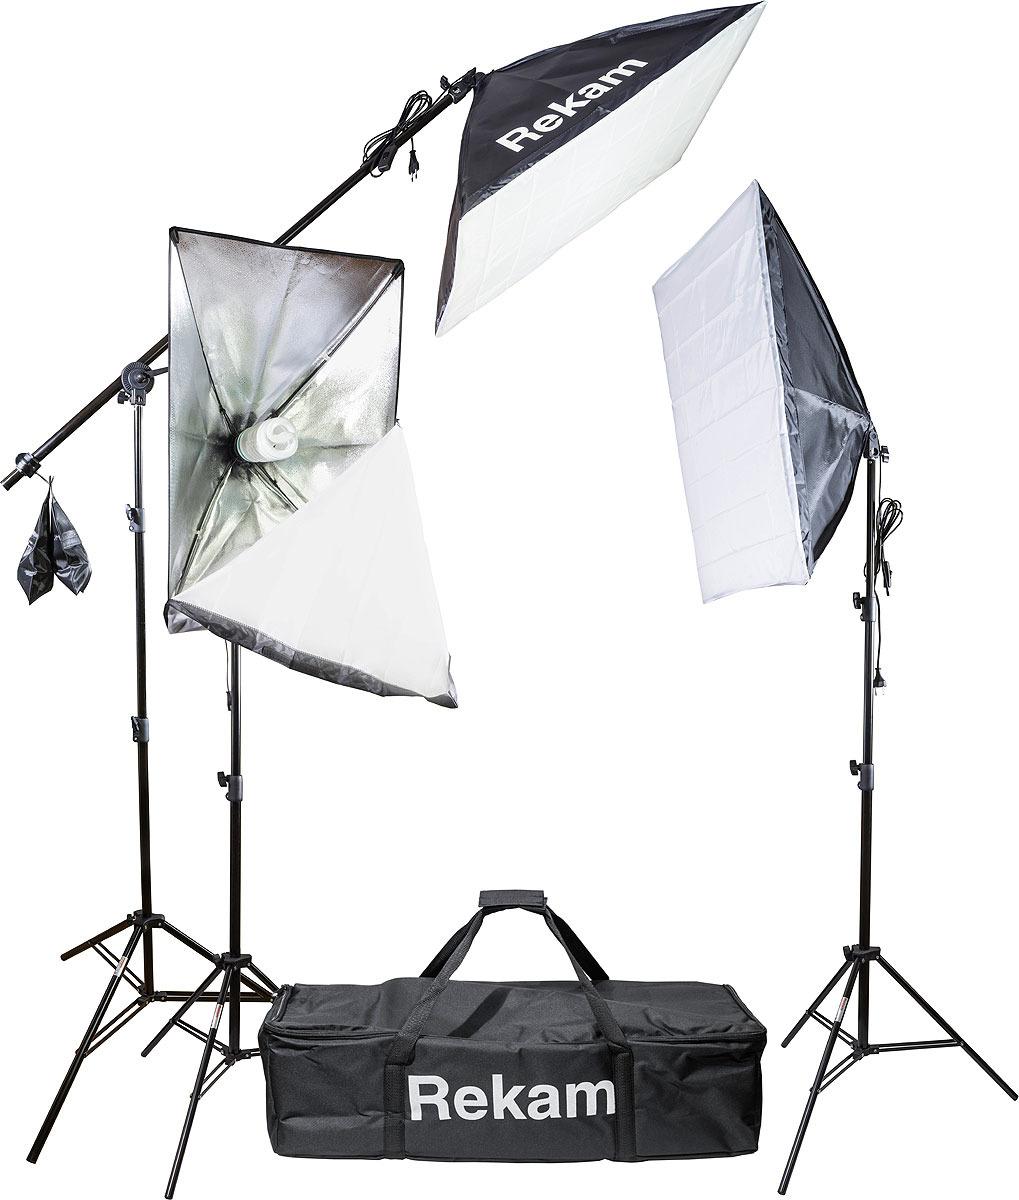 Комплект флуоресцентных осветителей Rekam CL-435-FL3-SB Boom Kit & CL-435-FL3-SB B Kit, Black цена и фото